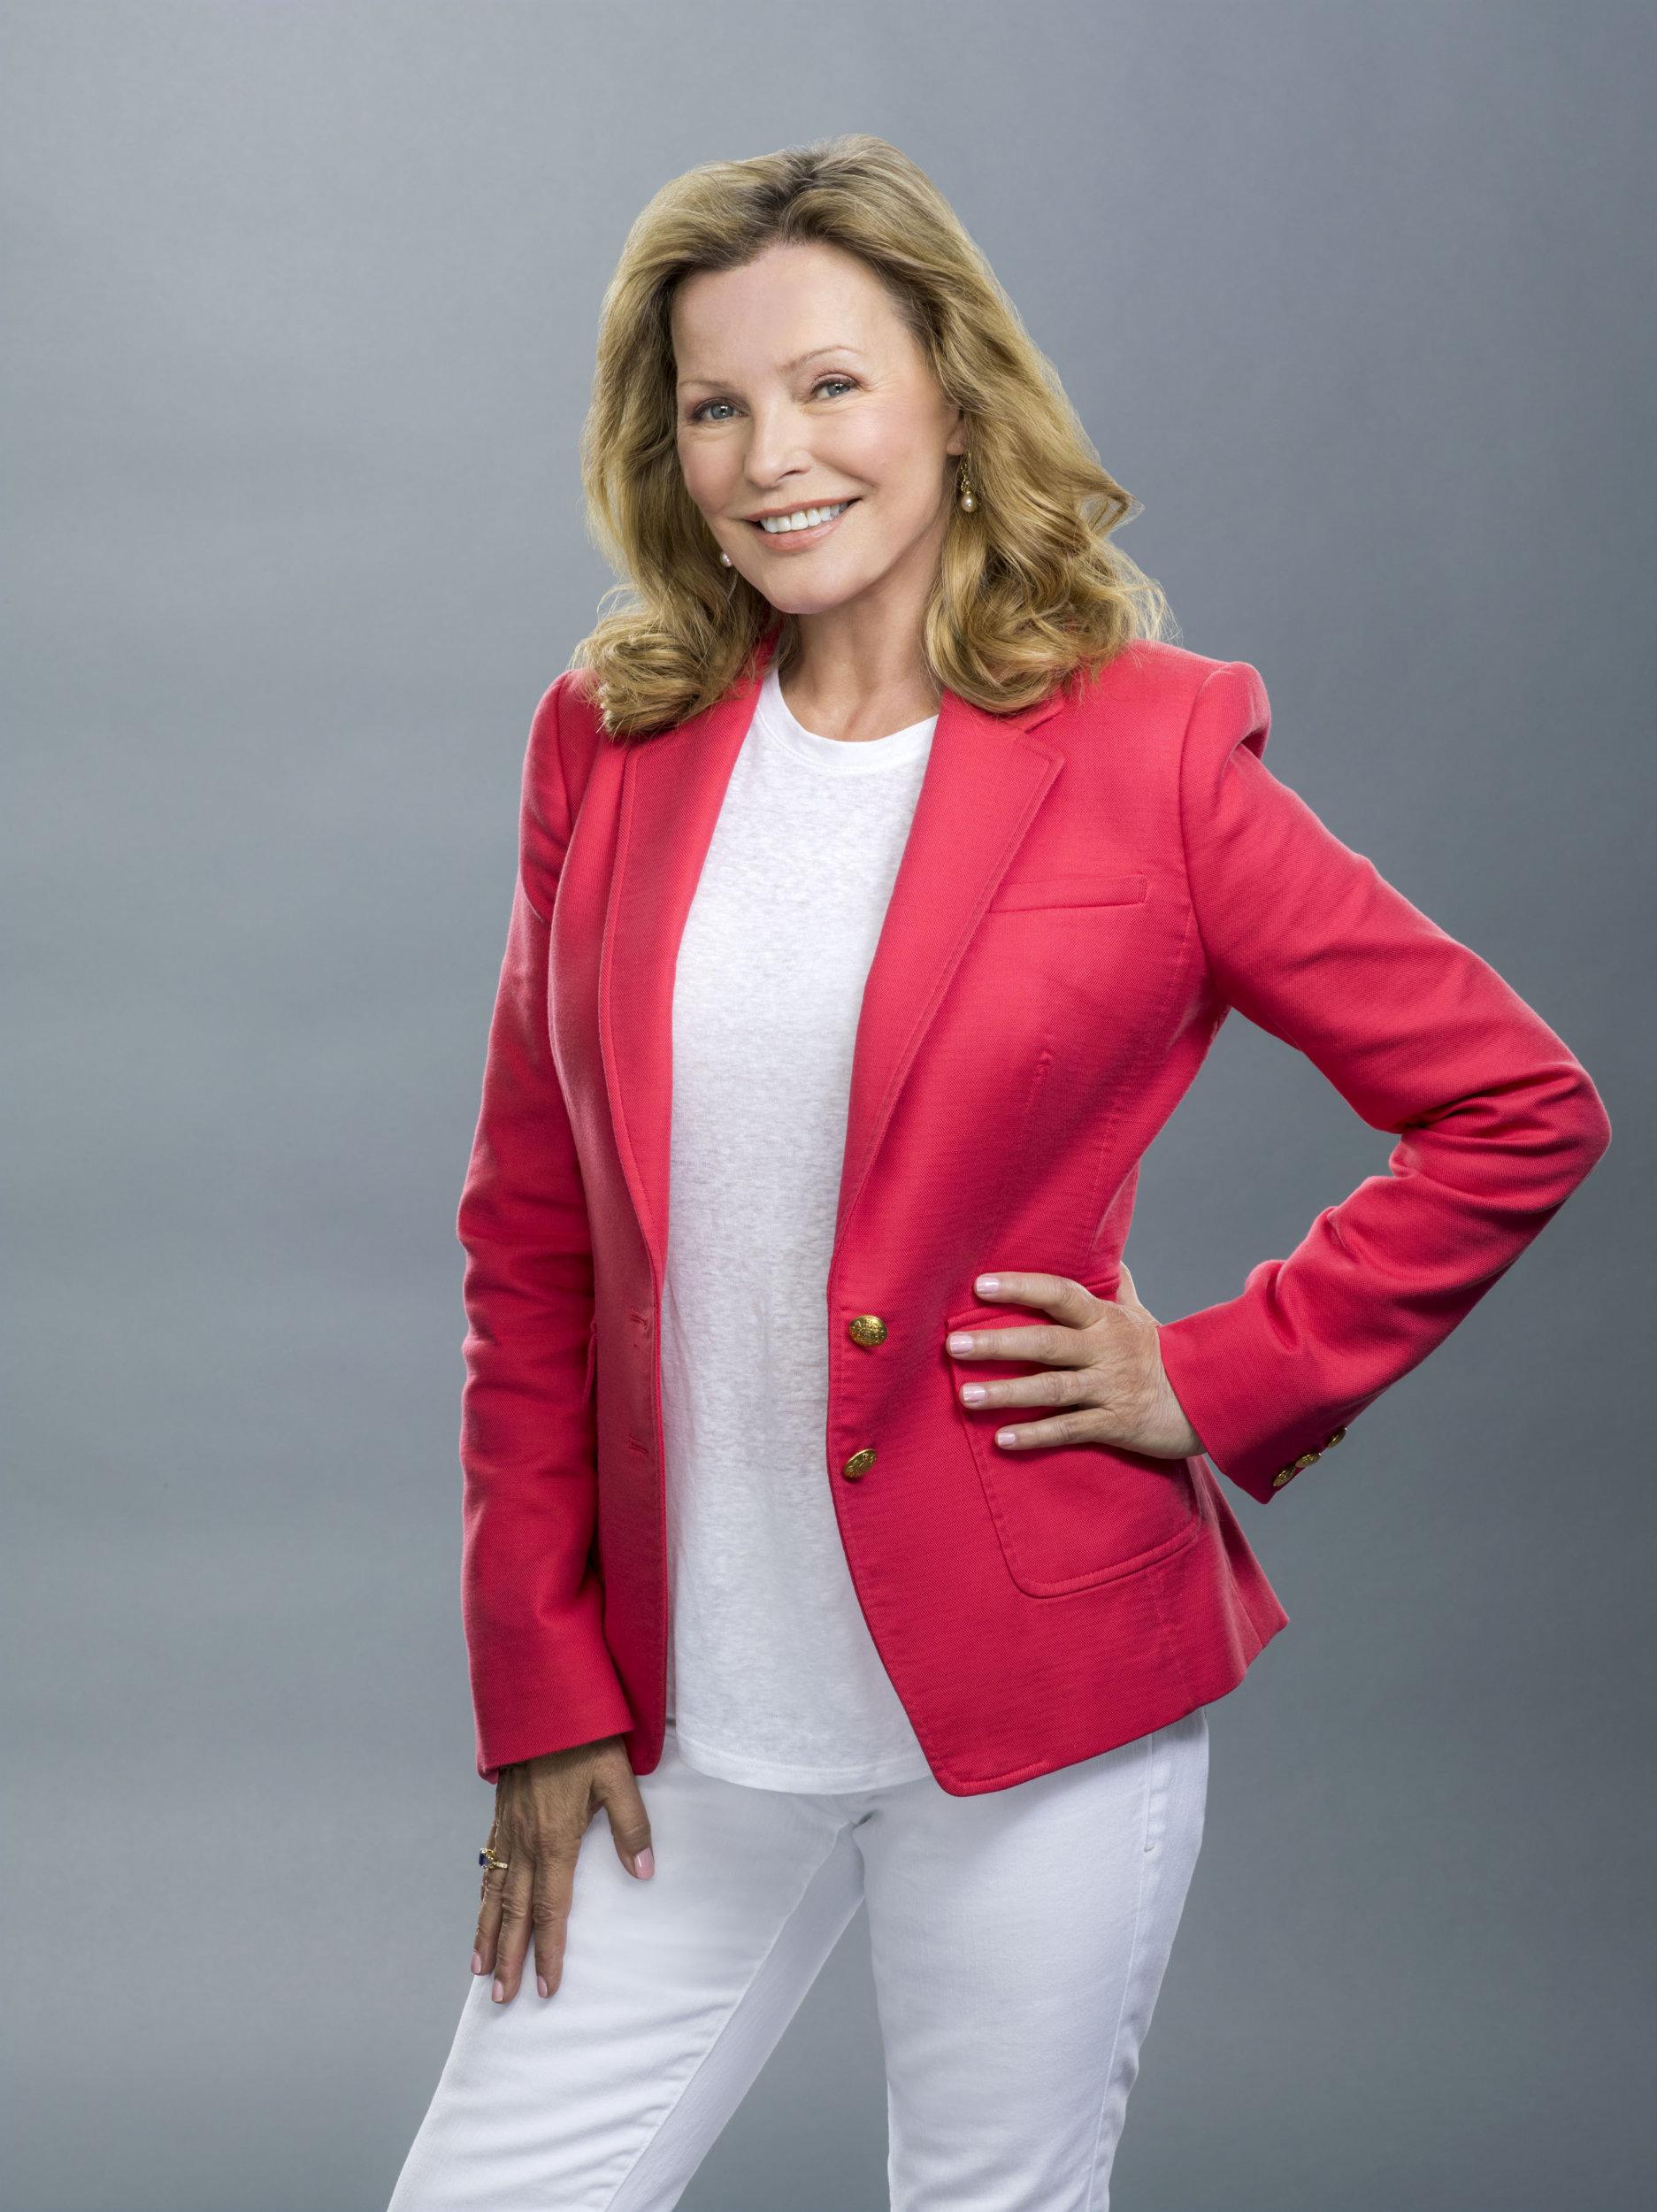 Cast - Cheryl Ladd